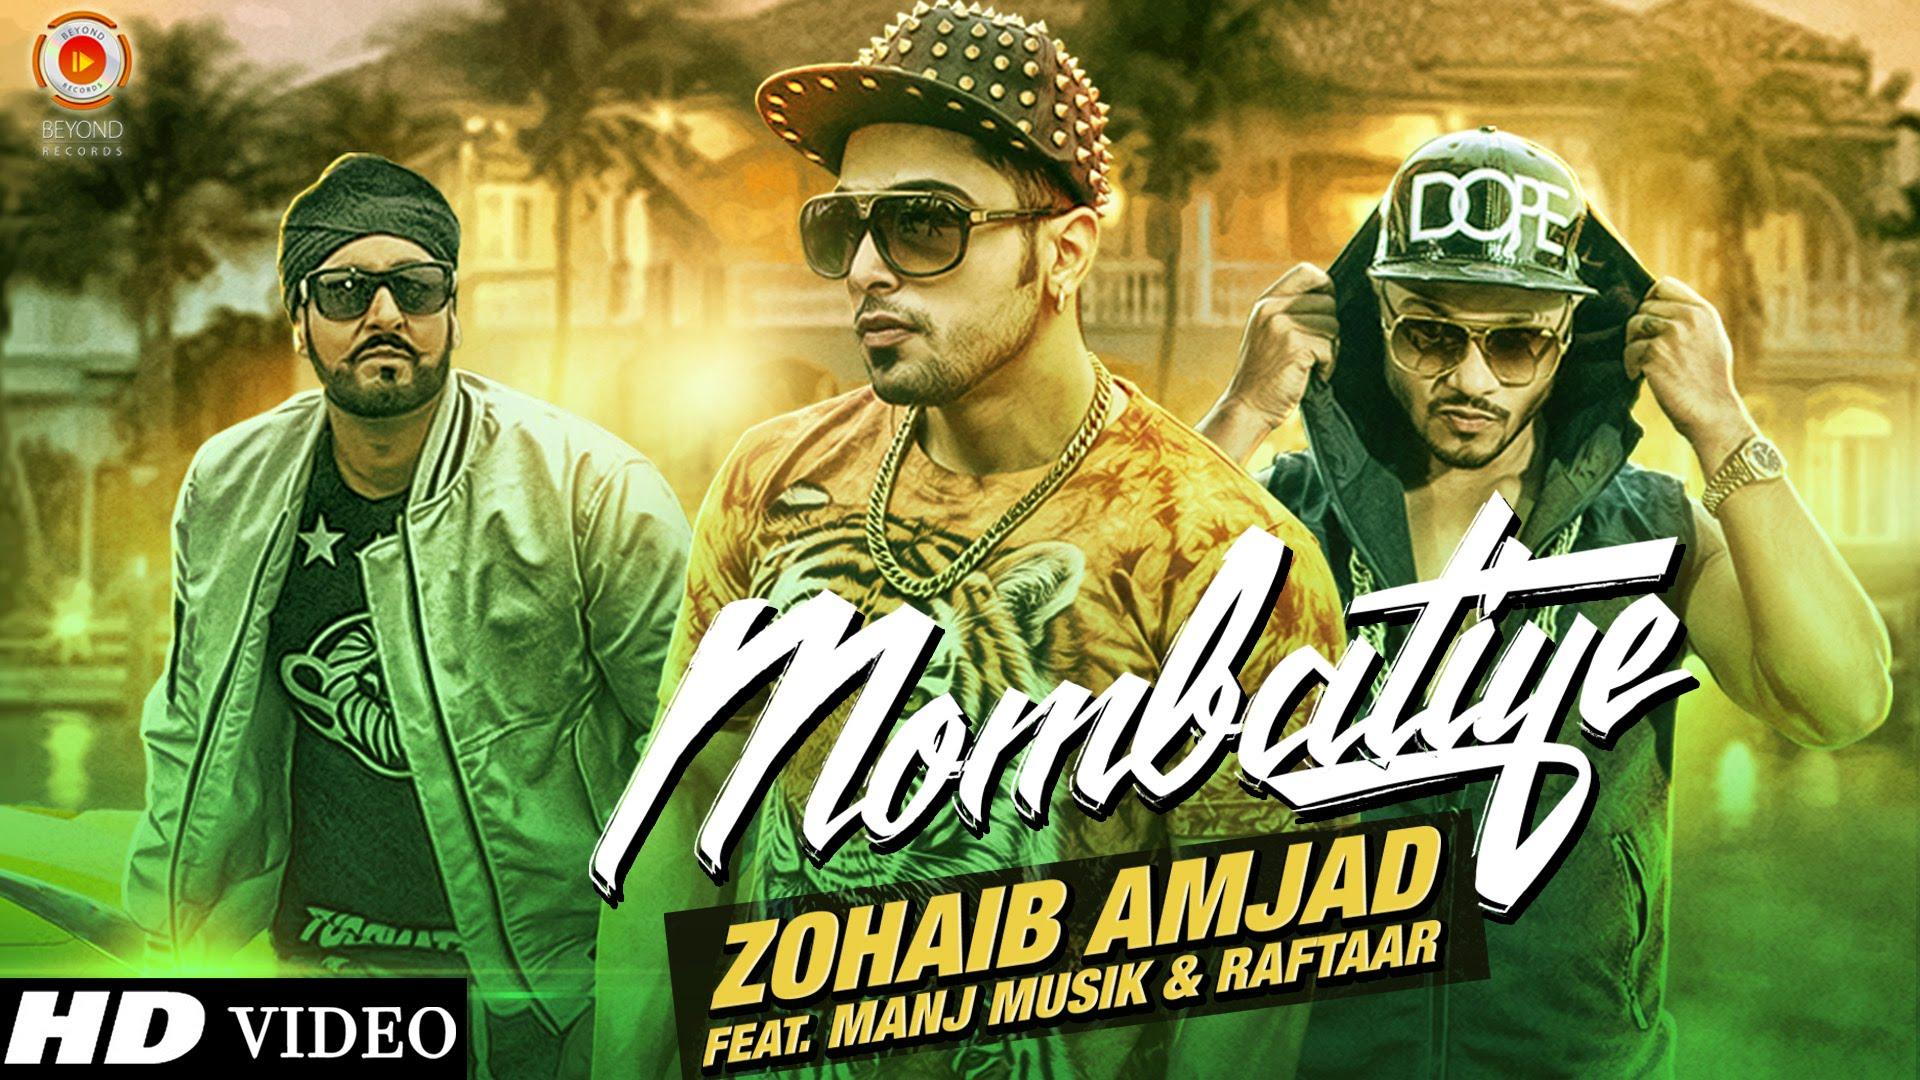 Zohaib Amjad ft. Raftaar & Manj Musik - Mombatiye (Full Video)